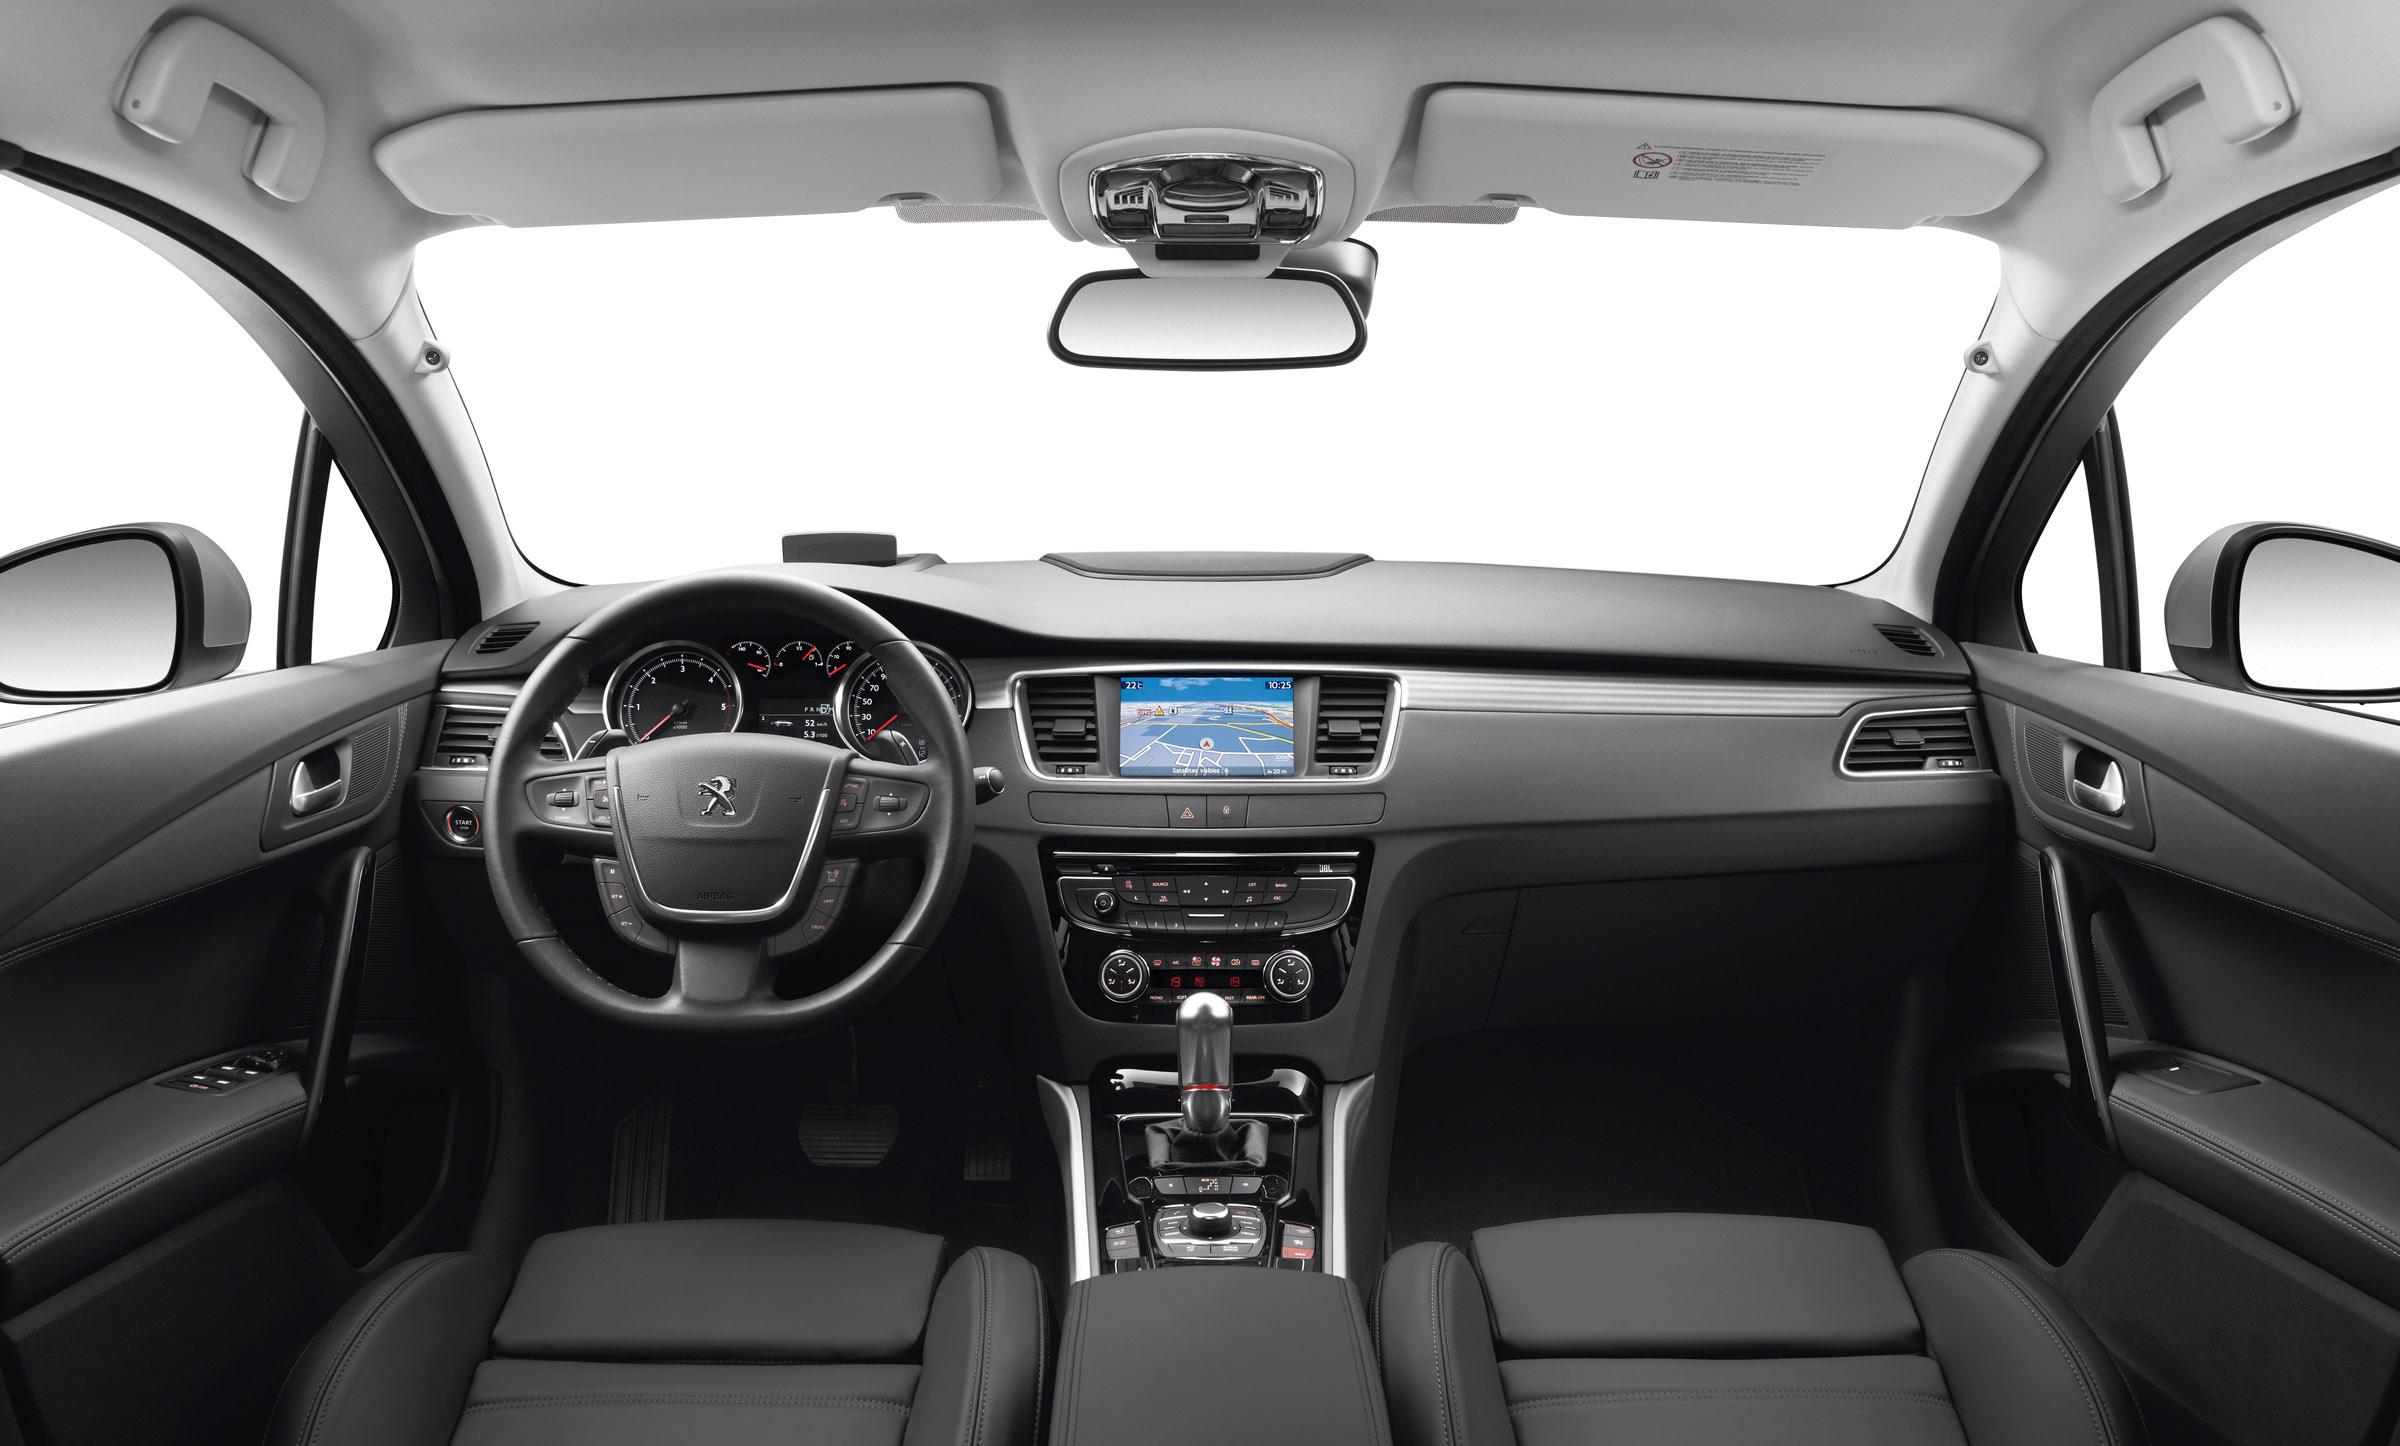 2014 Peugeot 508 SW